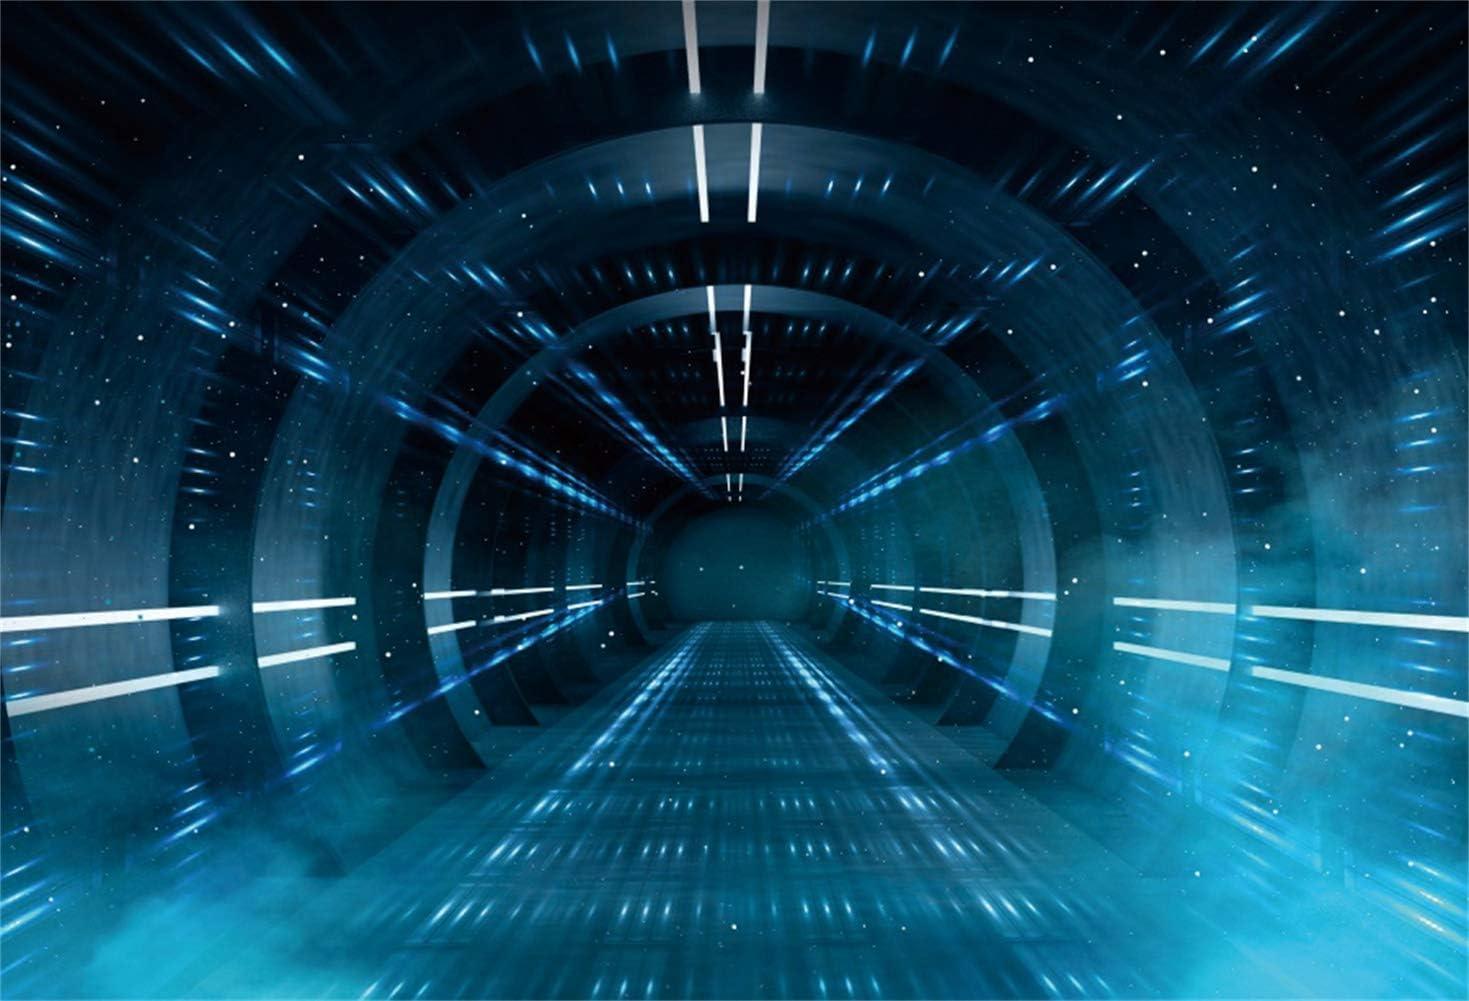 Time Tunnel Backdrop Metallic Hallway Imagination Space Backdrop 9x7ft Vinyl Photography Backgroud Bright Light Spaceship Interior Backgroud Boys Birthday Photo Backdrop Children Party